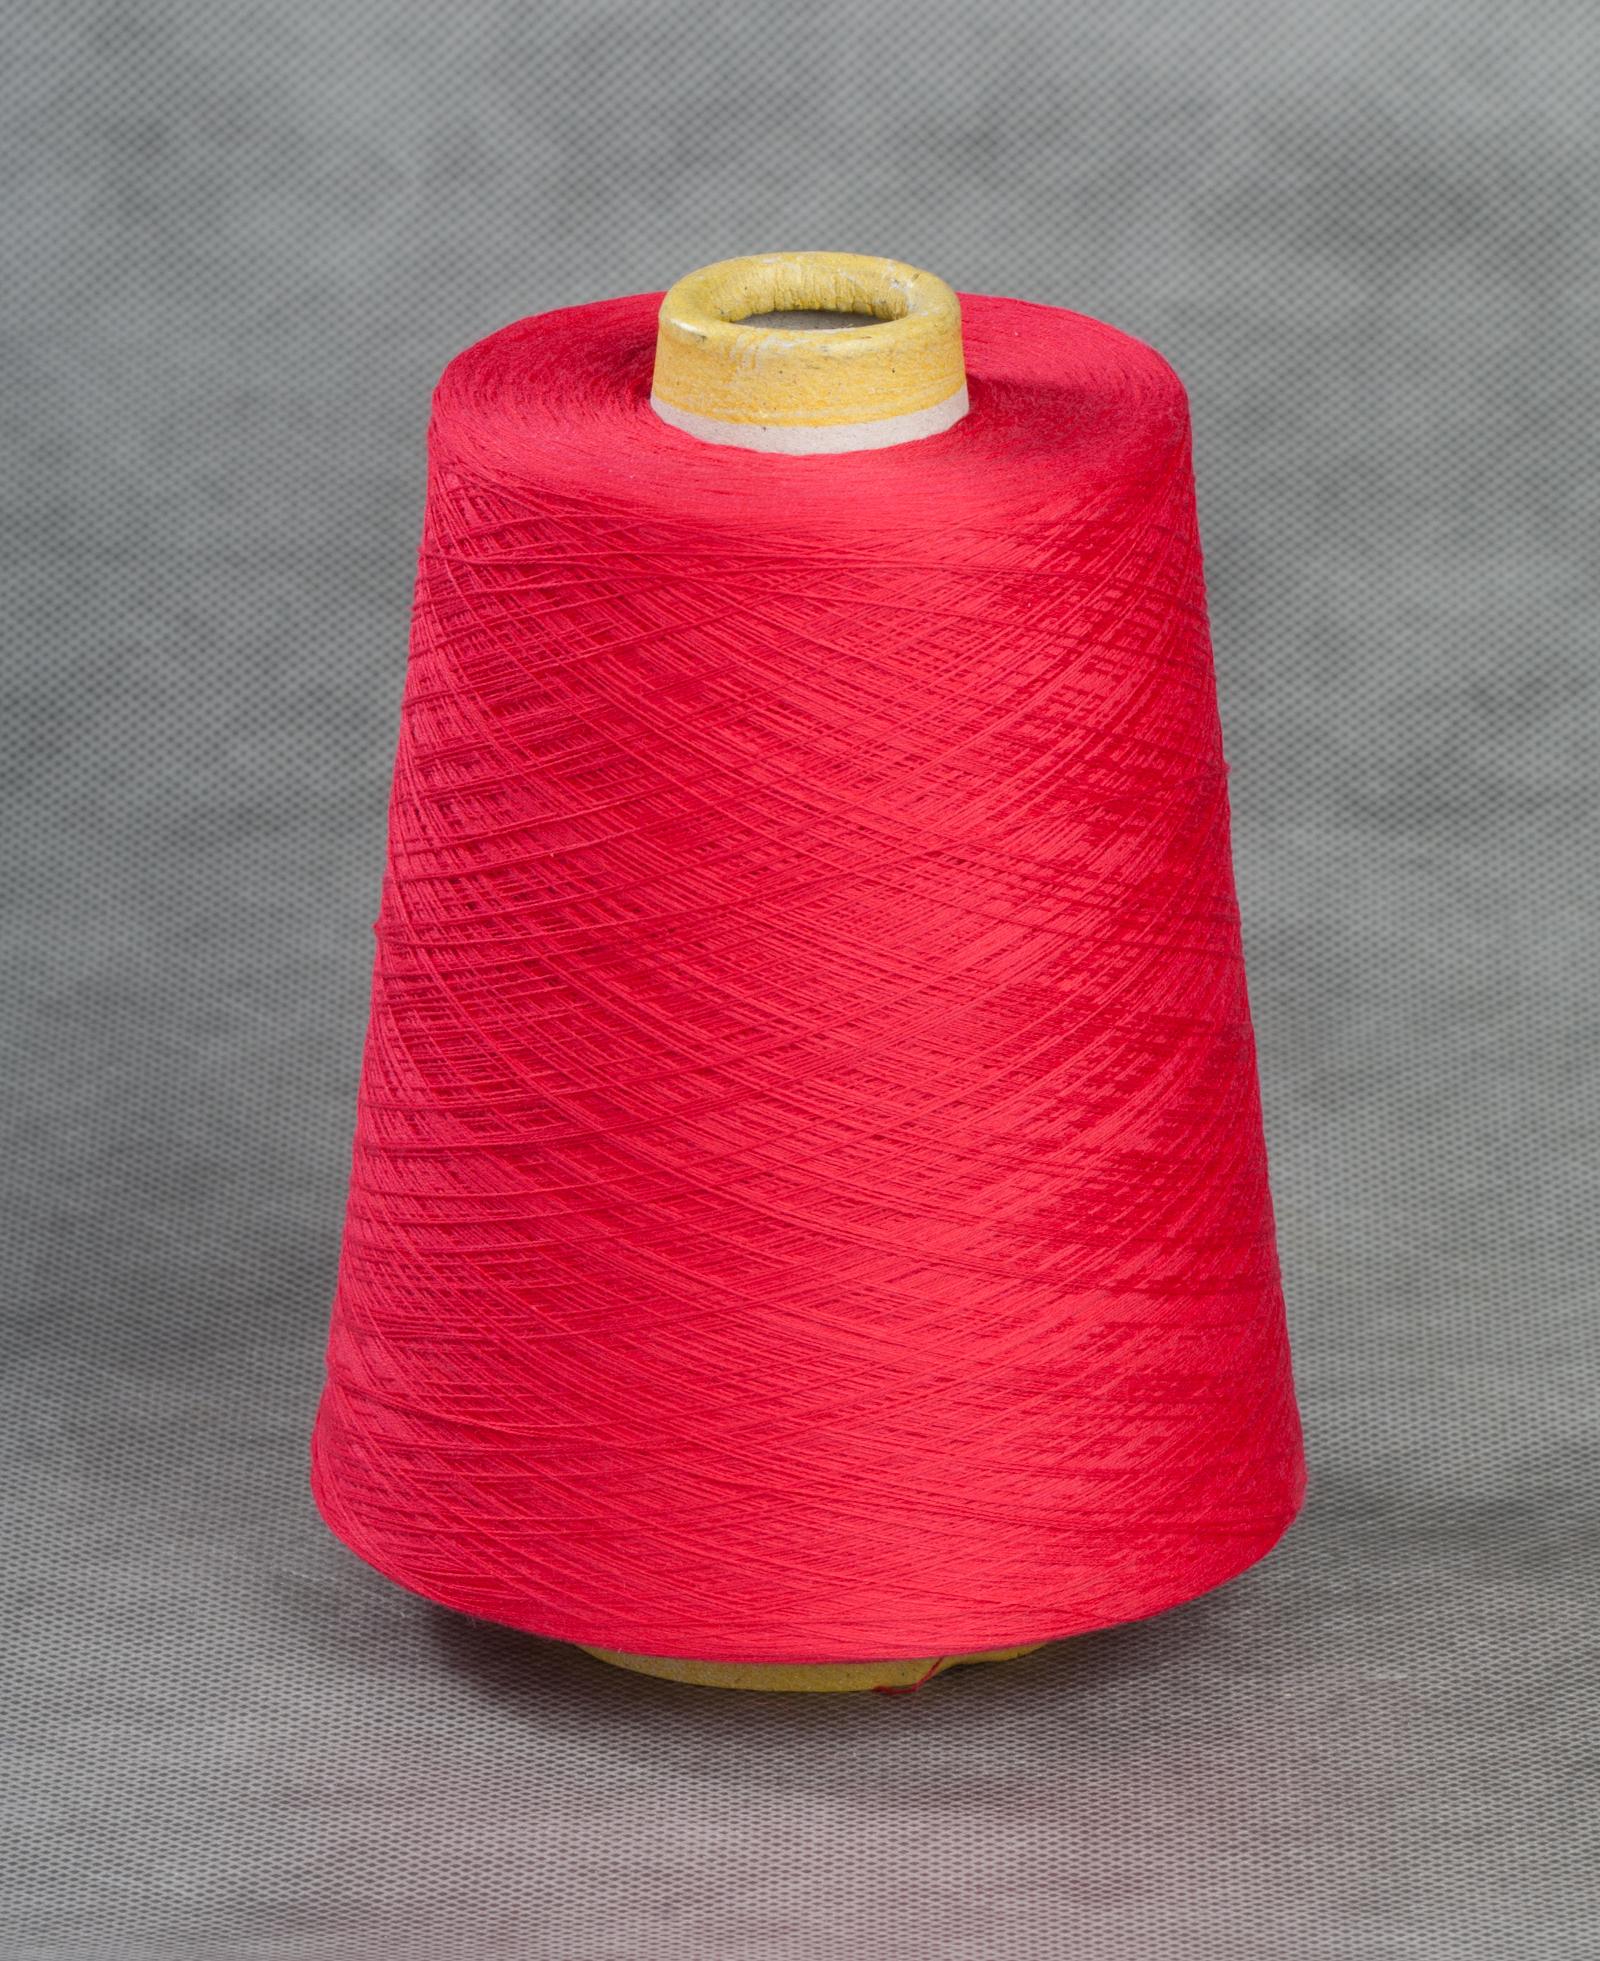 18008-4 Season, хлопок с шелком, розовая фуксия